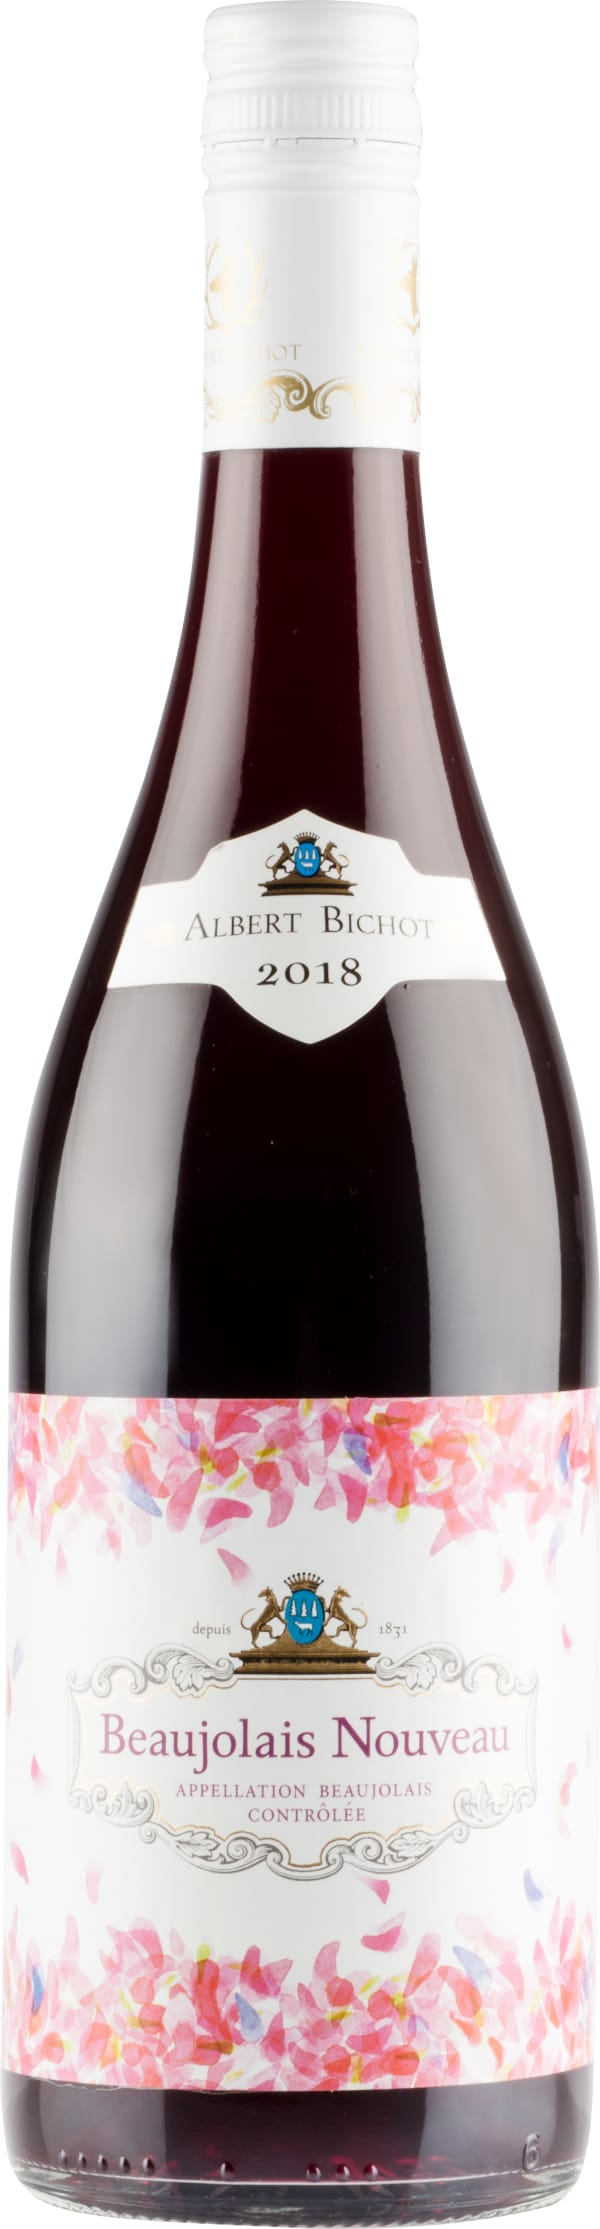 Albert Bichot Beaujolais Nouveau 2018